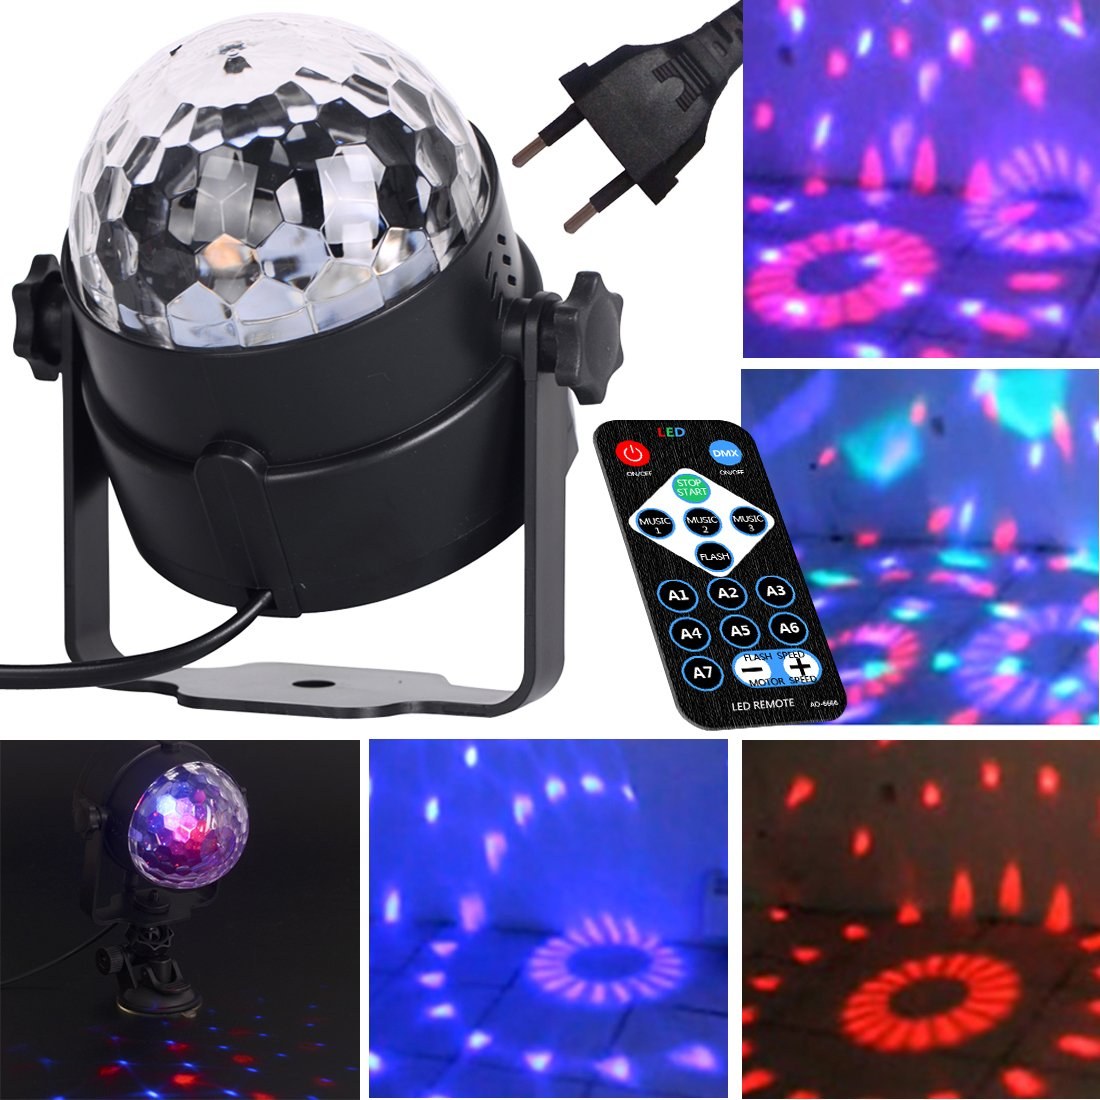 Zitfri Lumi Ere Discotheque Boule Disco Projecteur Lumi Ere Led